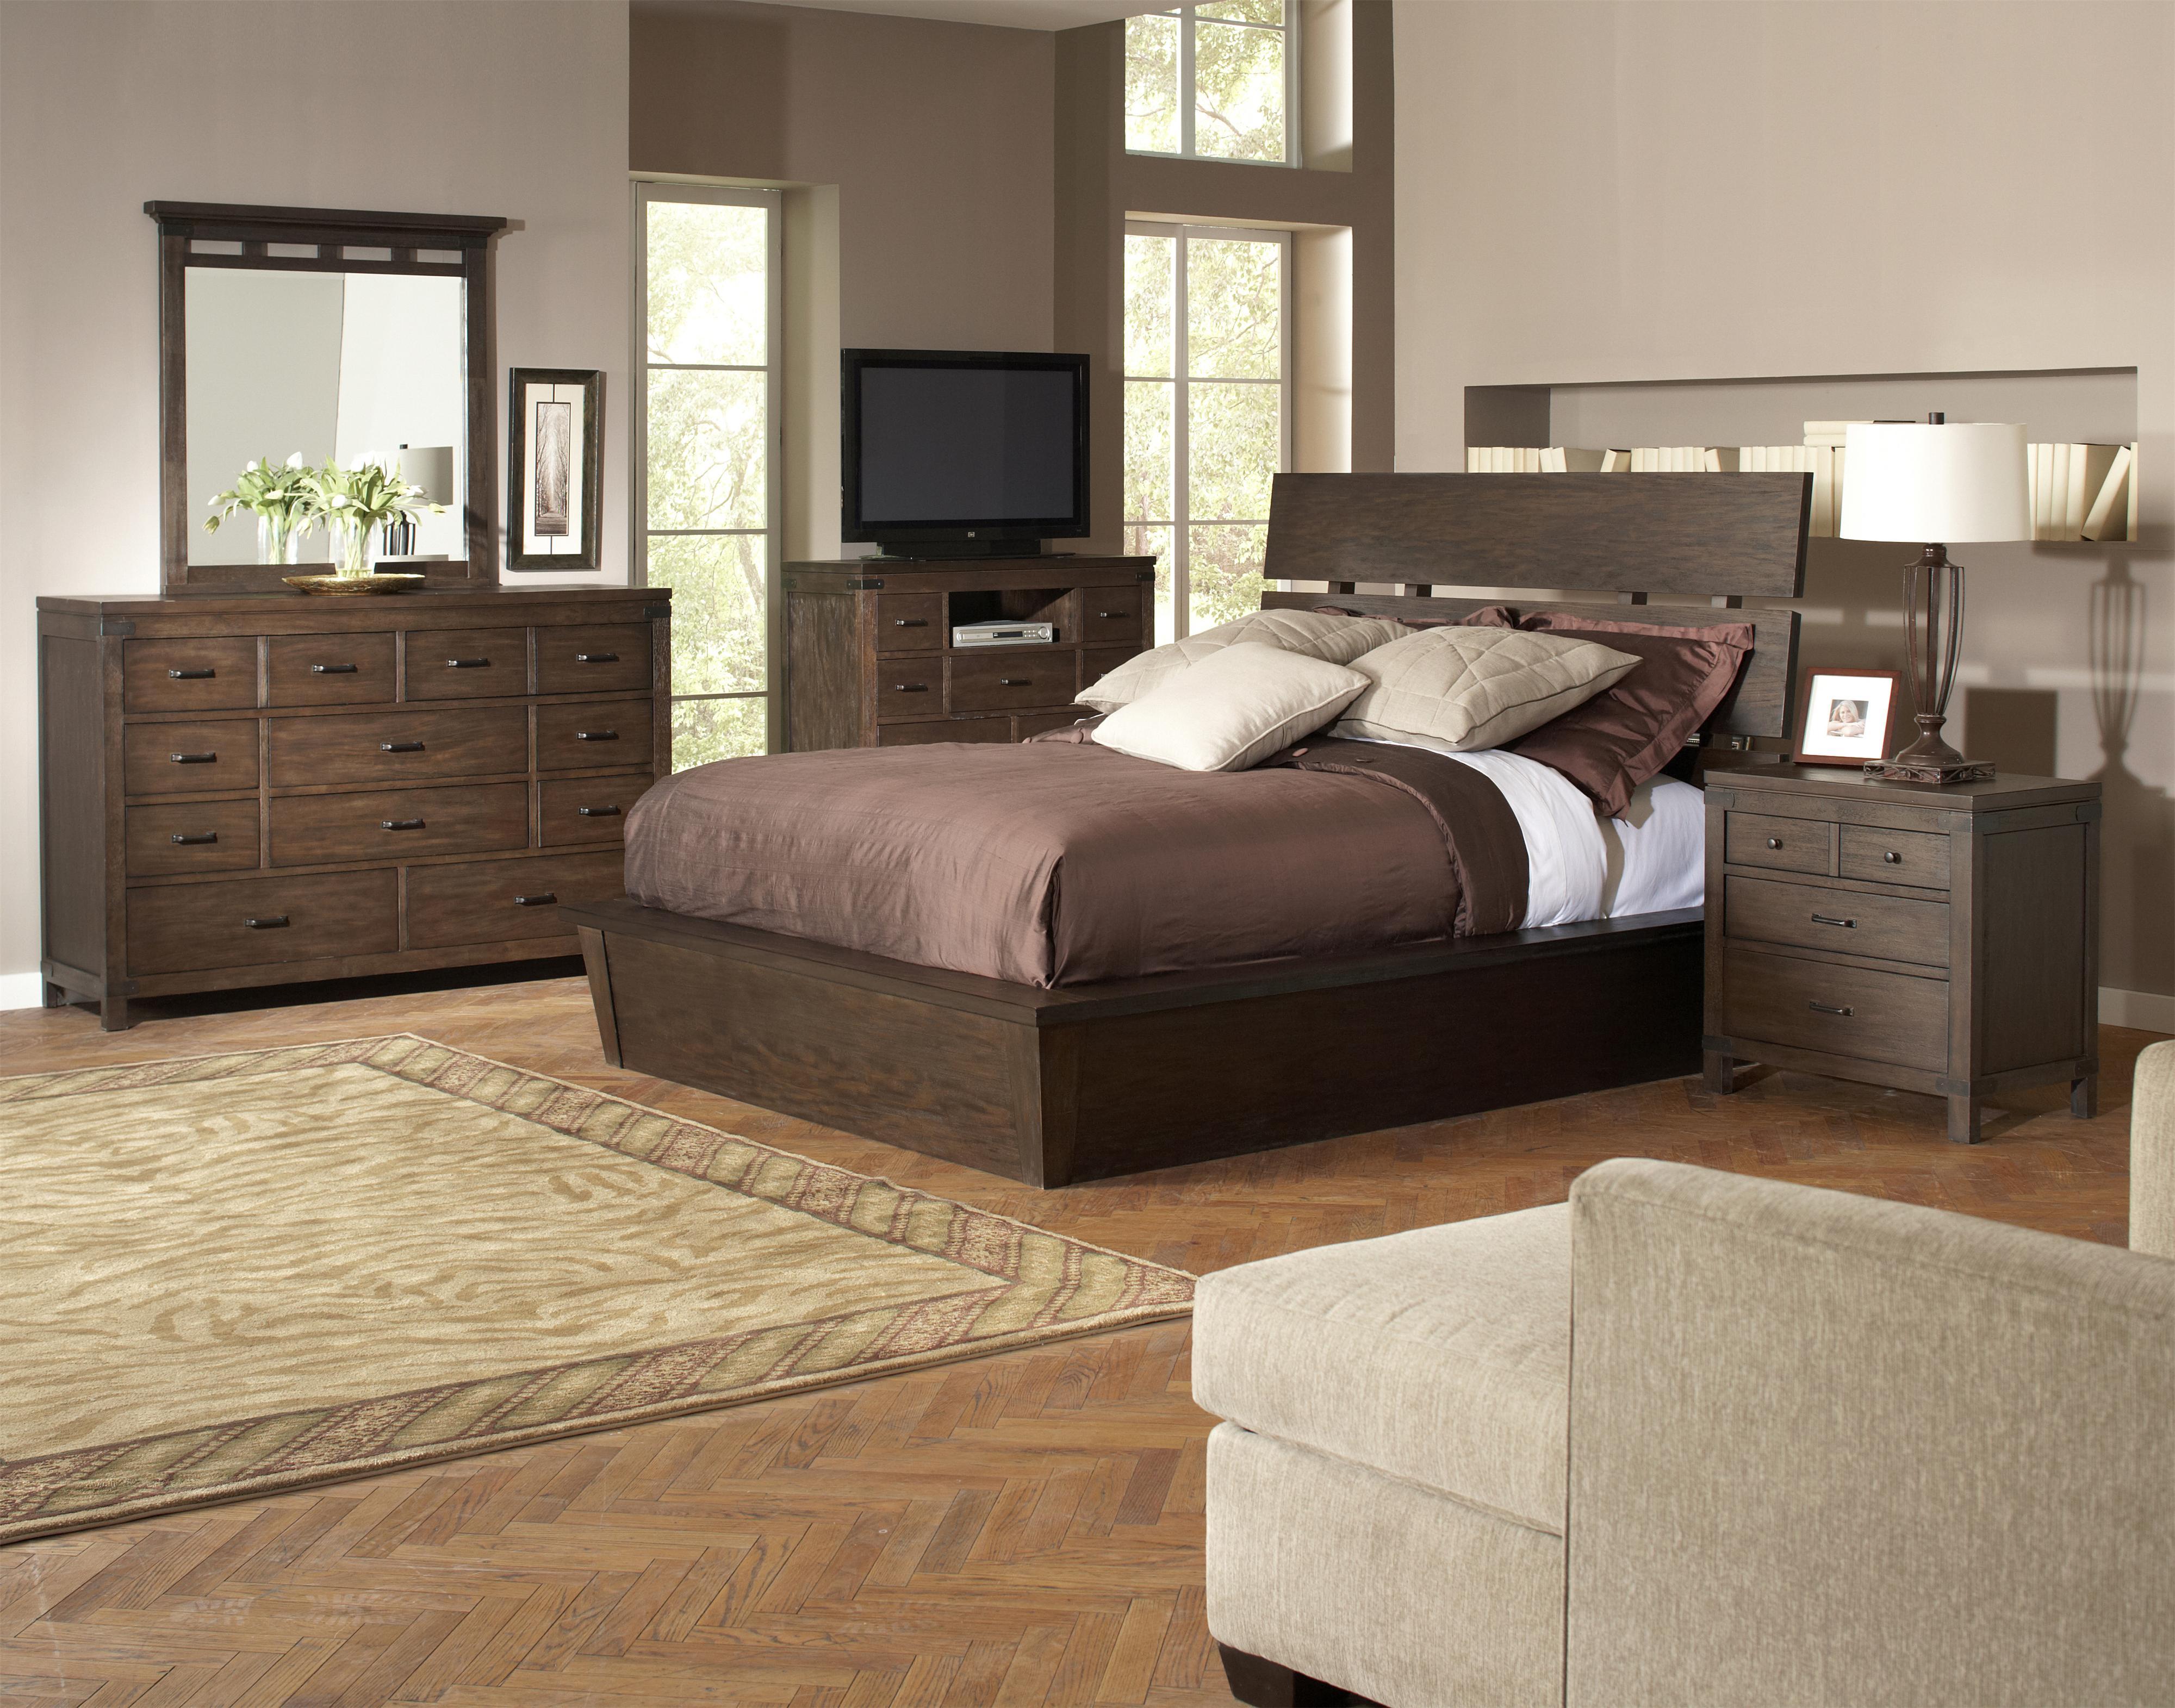 riverside furniture promenade california king bedroom group hudson 39 s furniture bedroom group. Black Bedroom Furniture Sets. Home Design Ideas